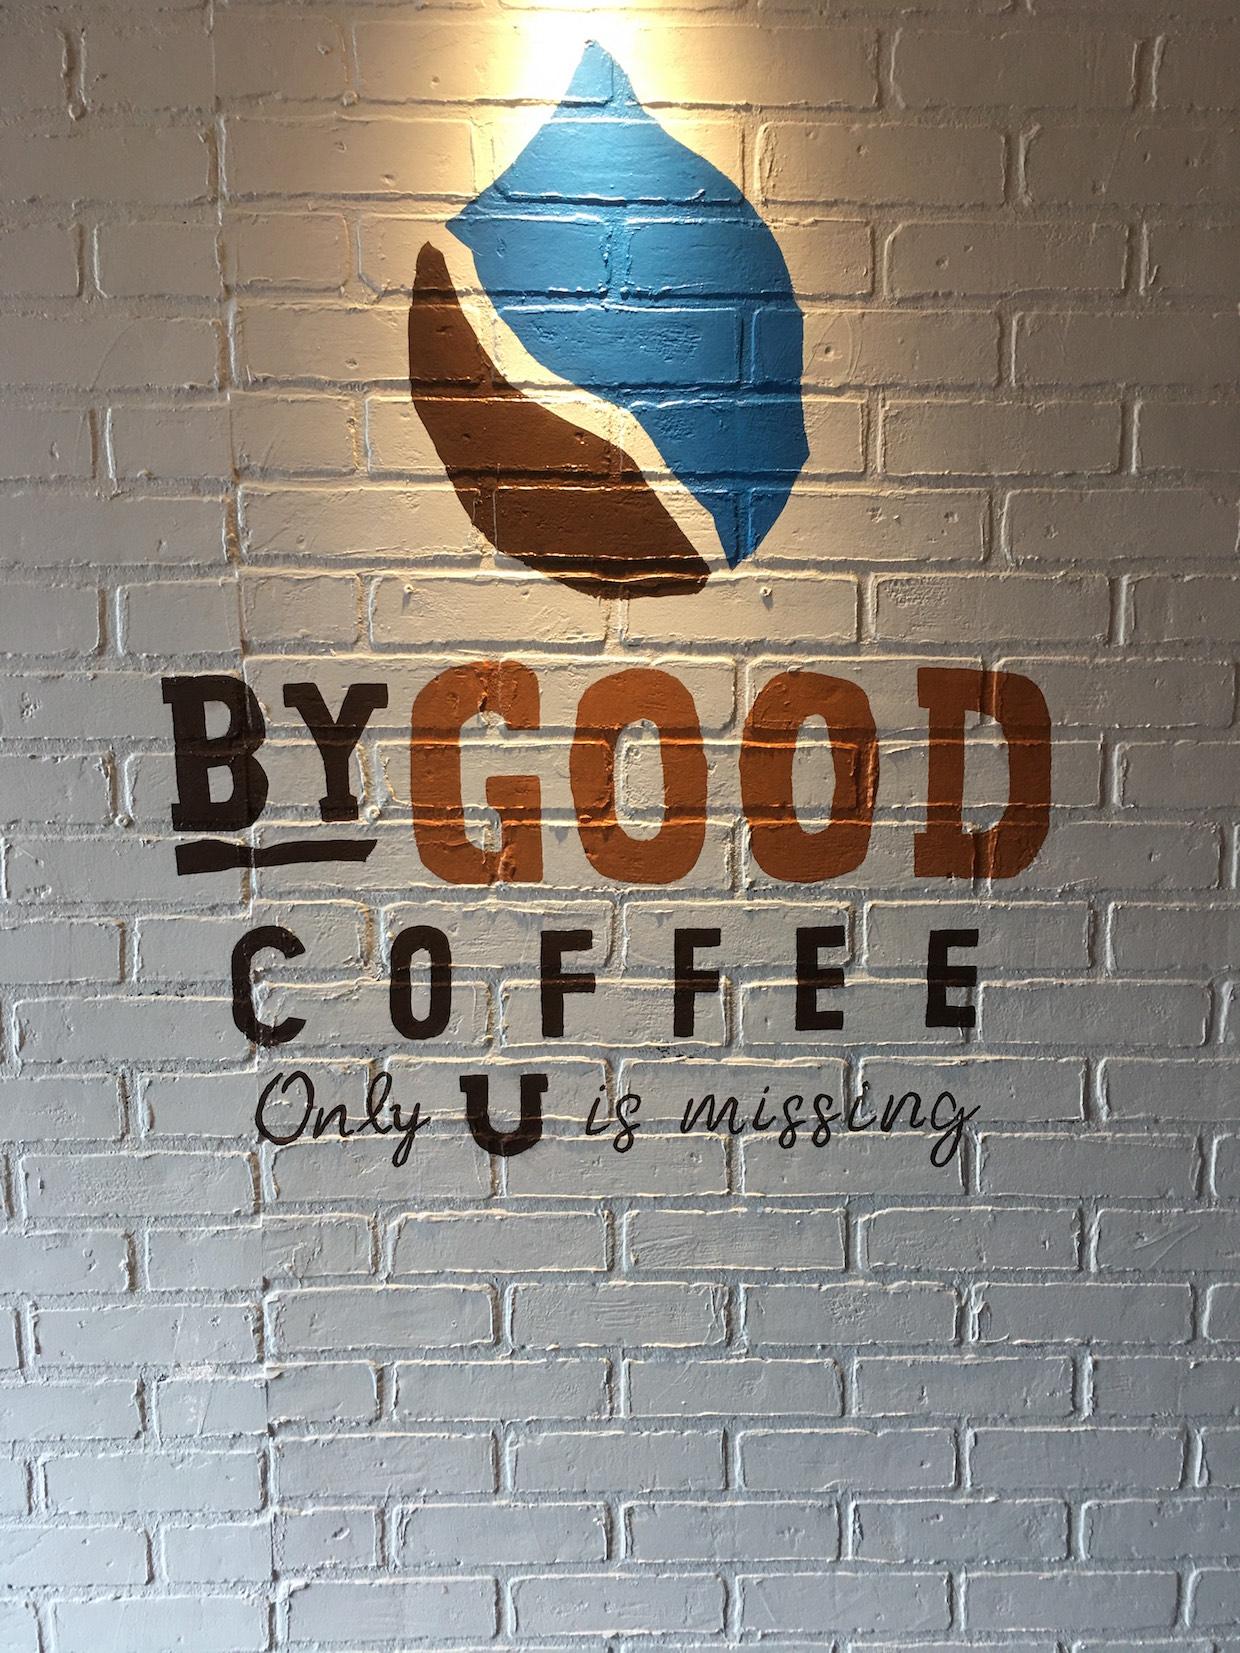 Bygood Coffee 2